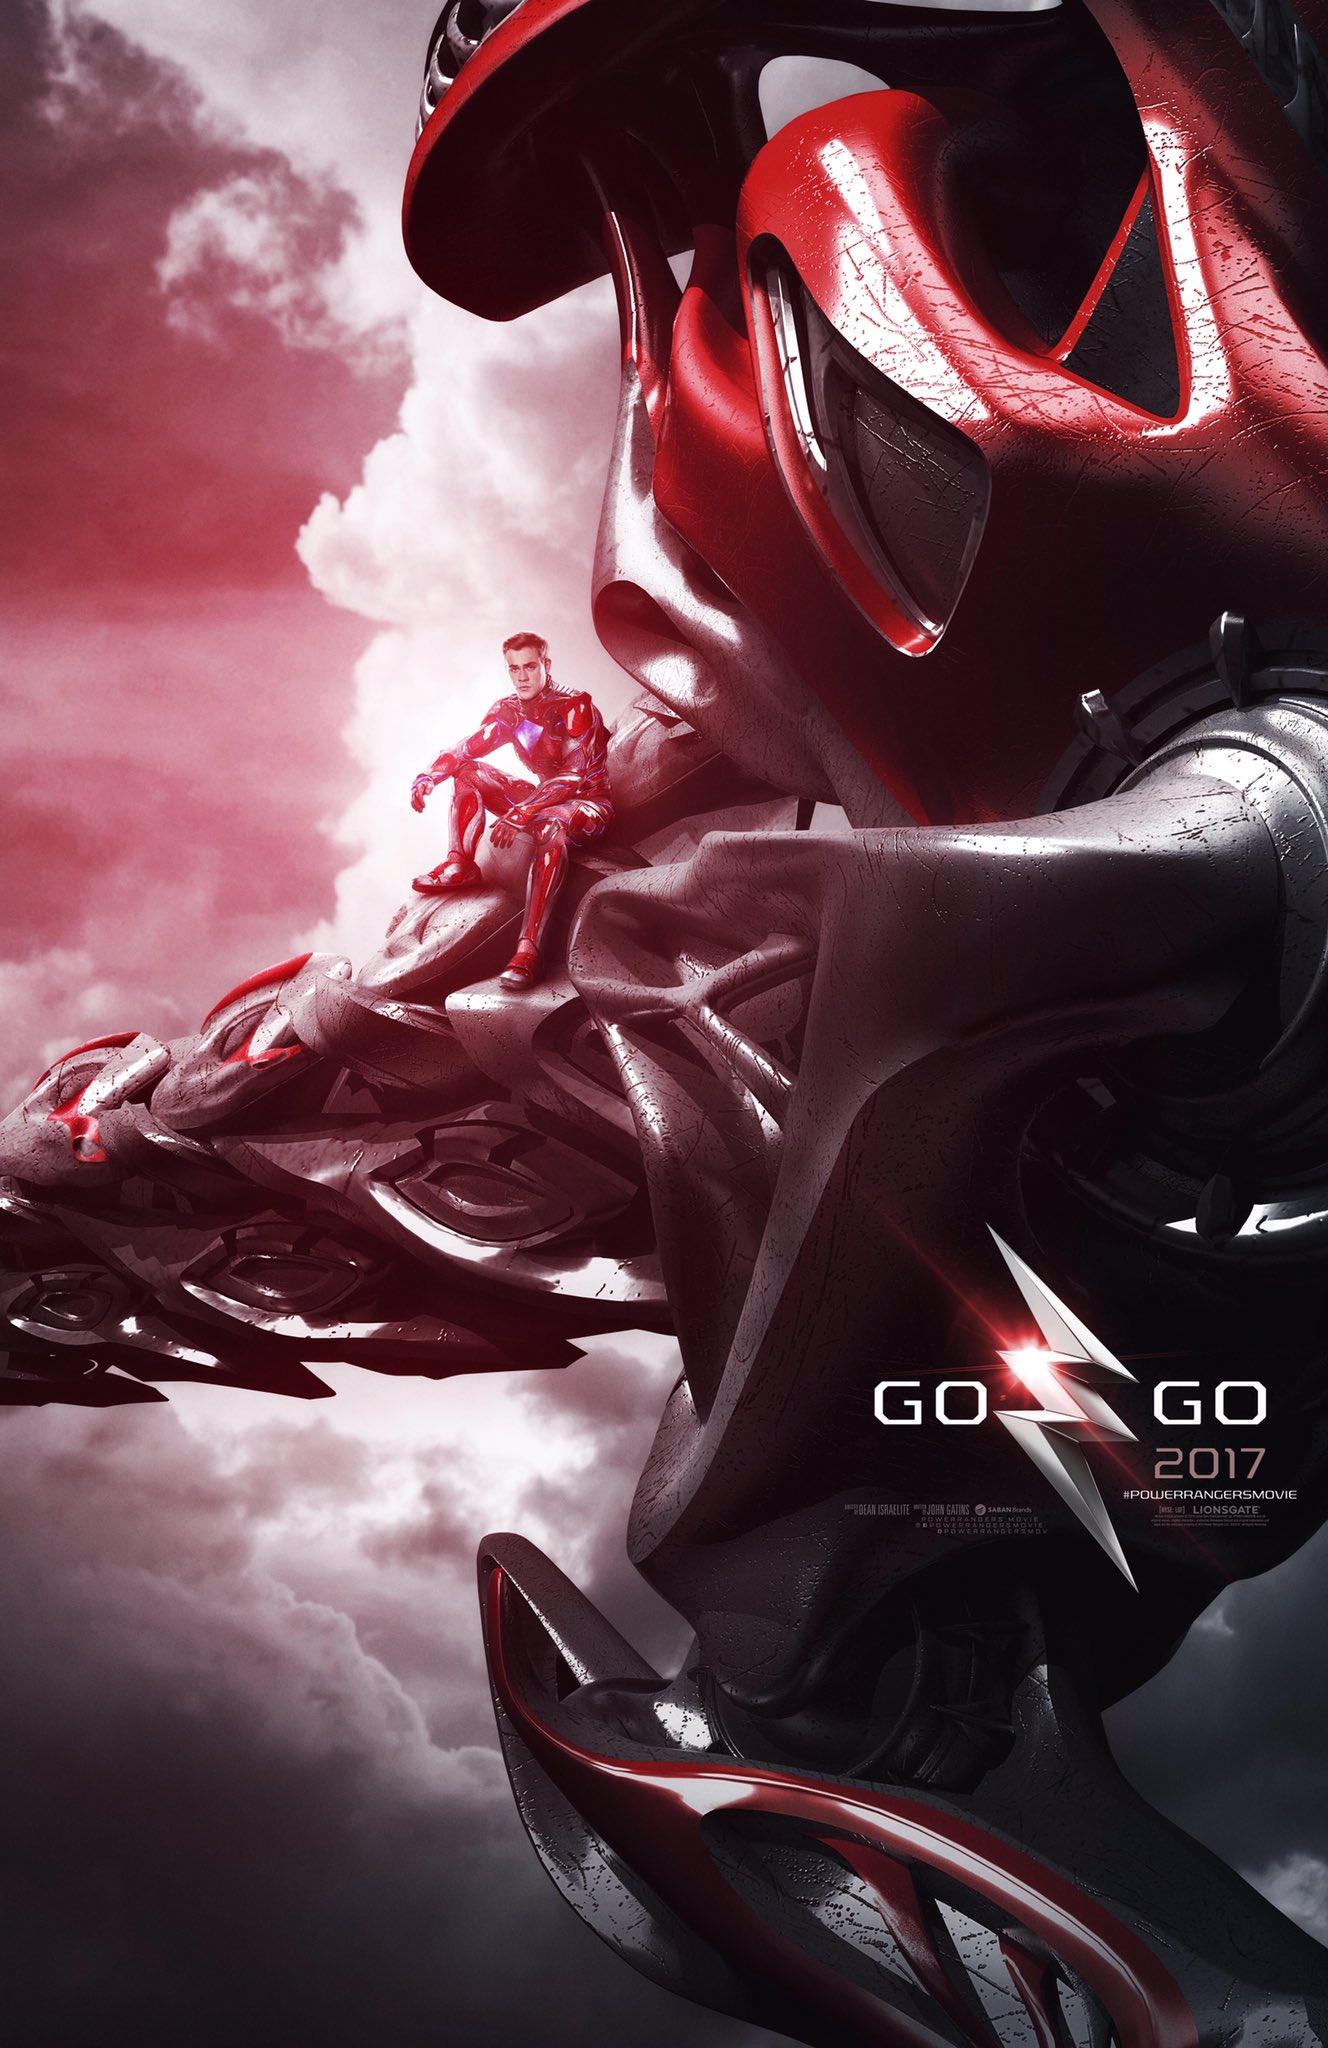 Промо-видео с NYCC-2016: John Wick: Chapter 2, Power Rangers, The Great Wall и Ninjak VS. The Valiant Universe 10